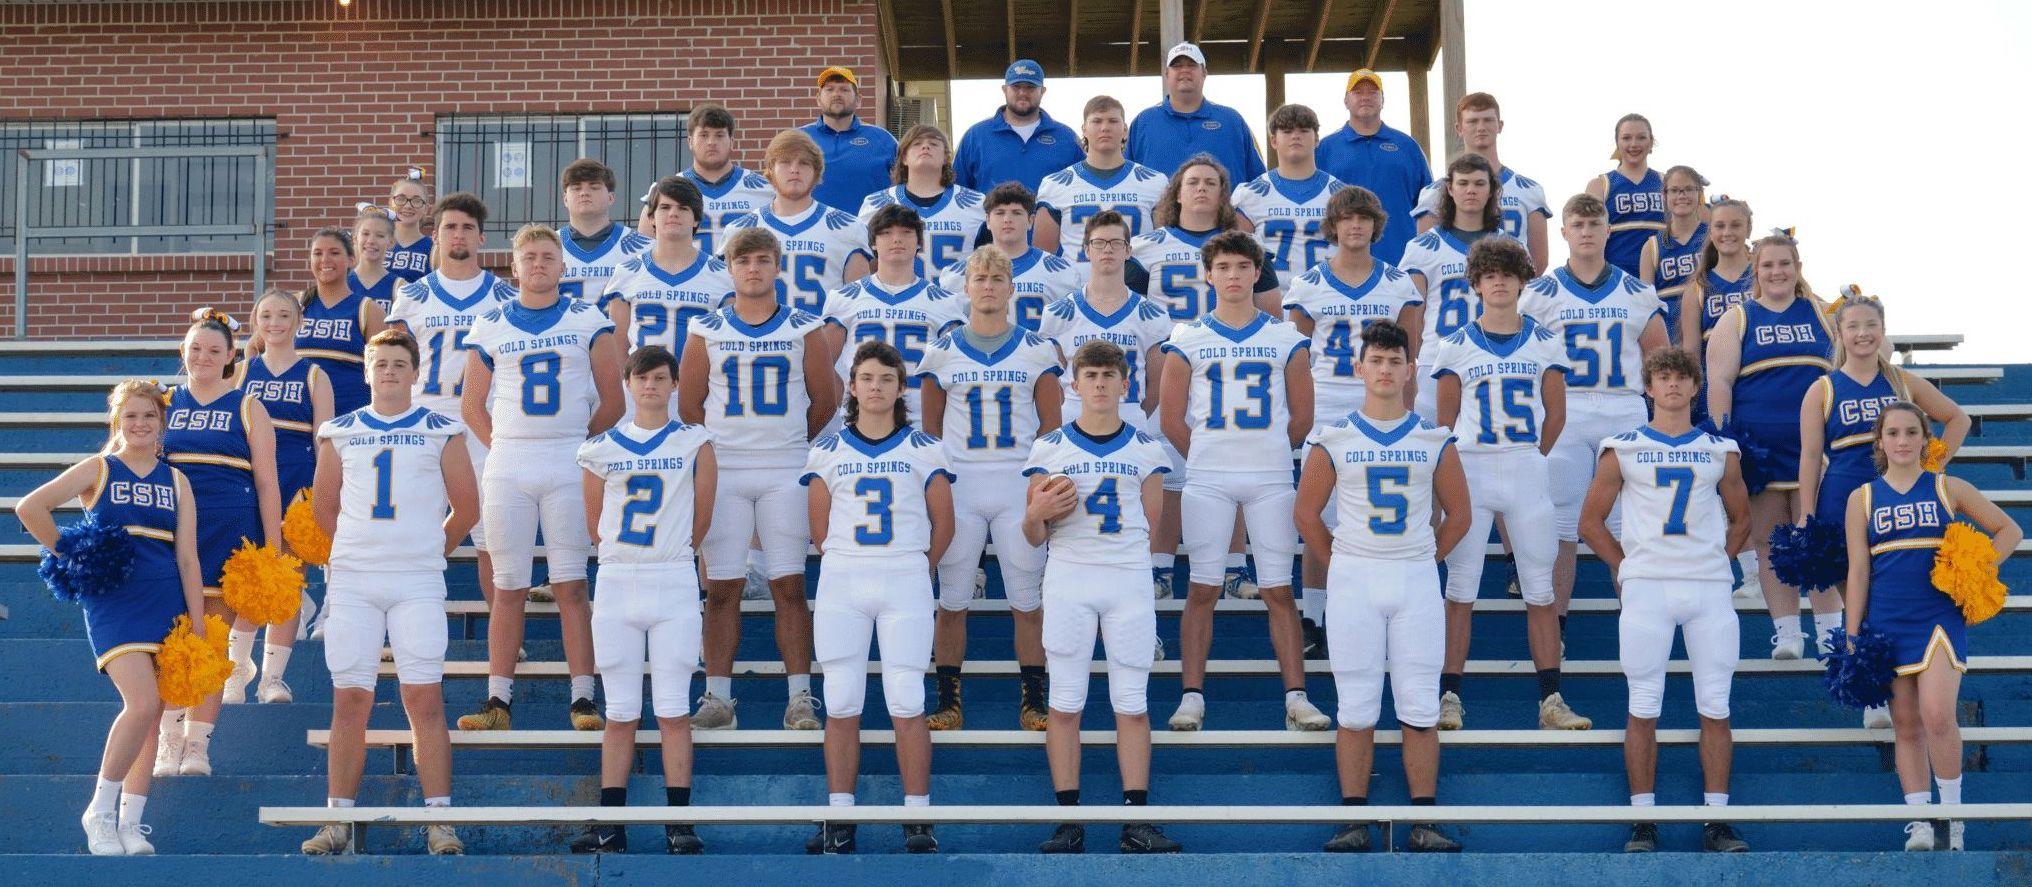 Cold Springs Varsity Football Team 2021-22